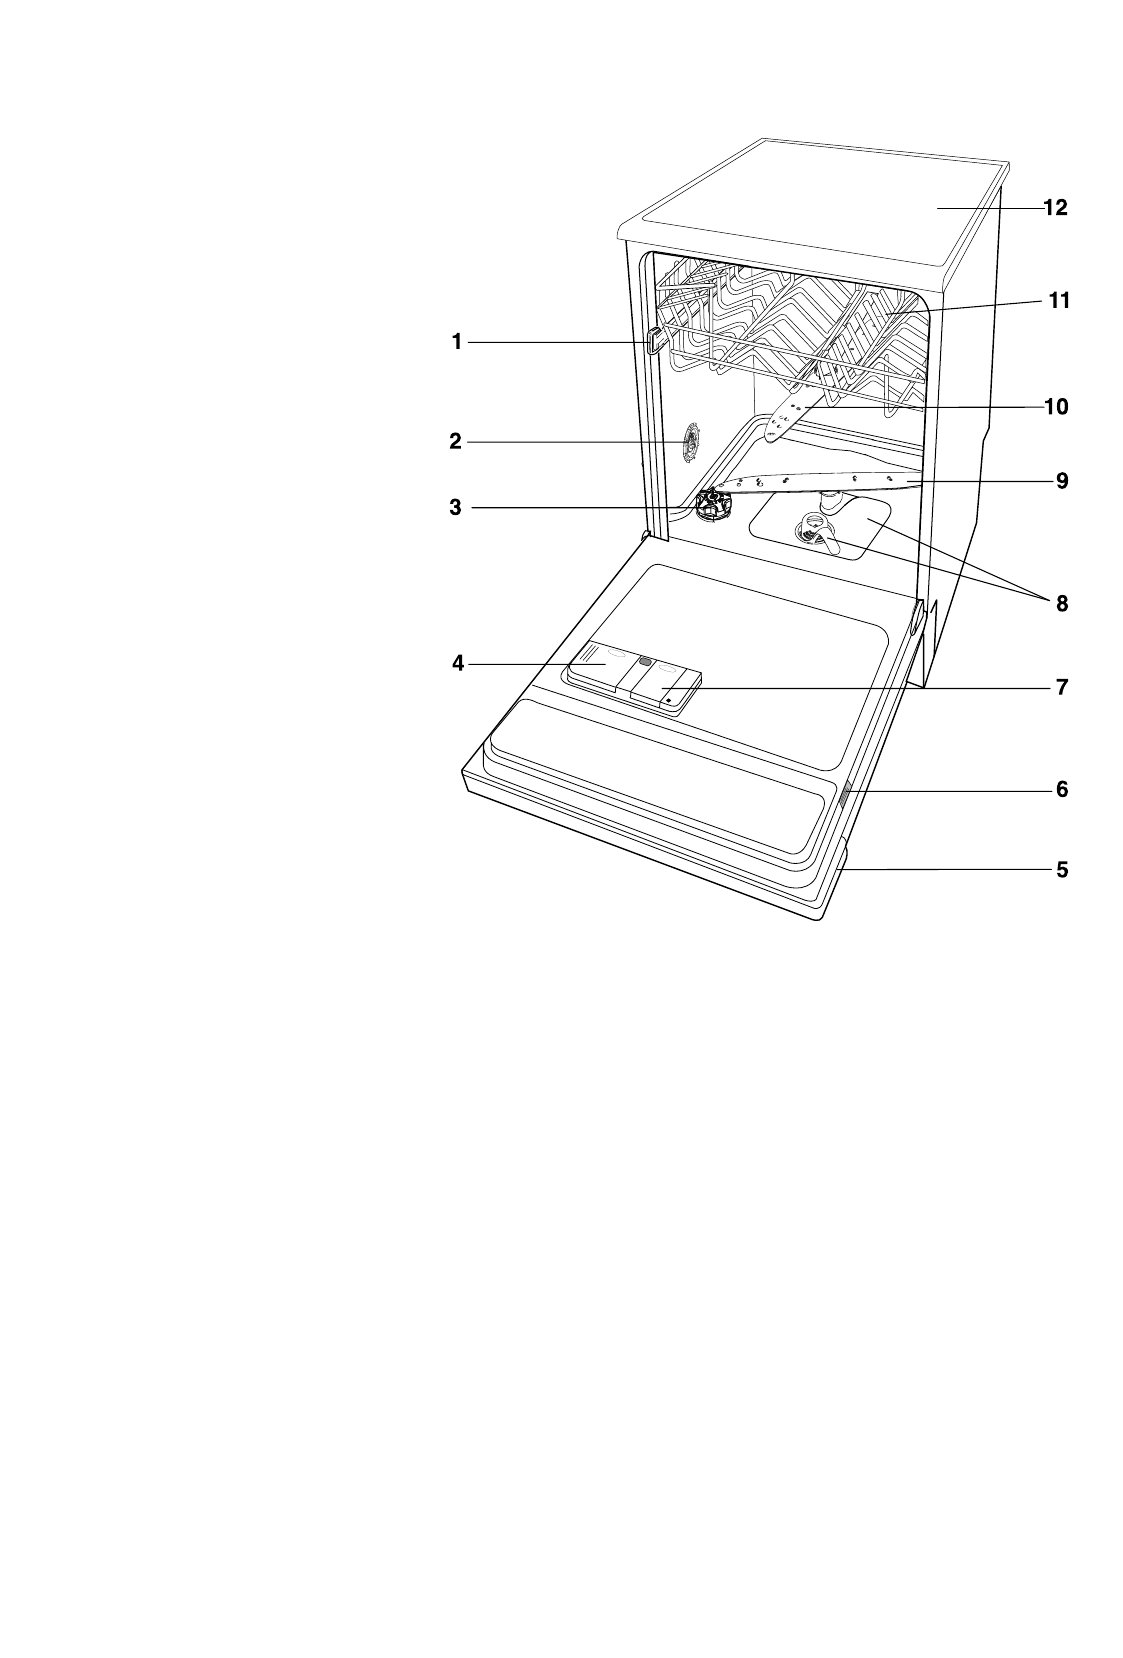 Zanussi Zdf 601 Instruction Booklet Washing Machine Wiring Diagram Service Manual Error Code Description Of The Appliance